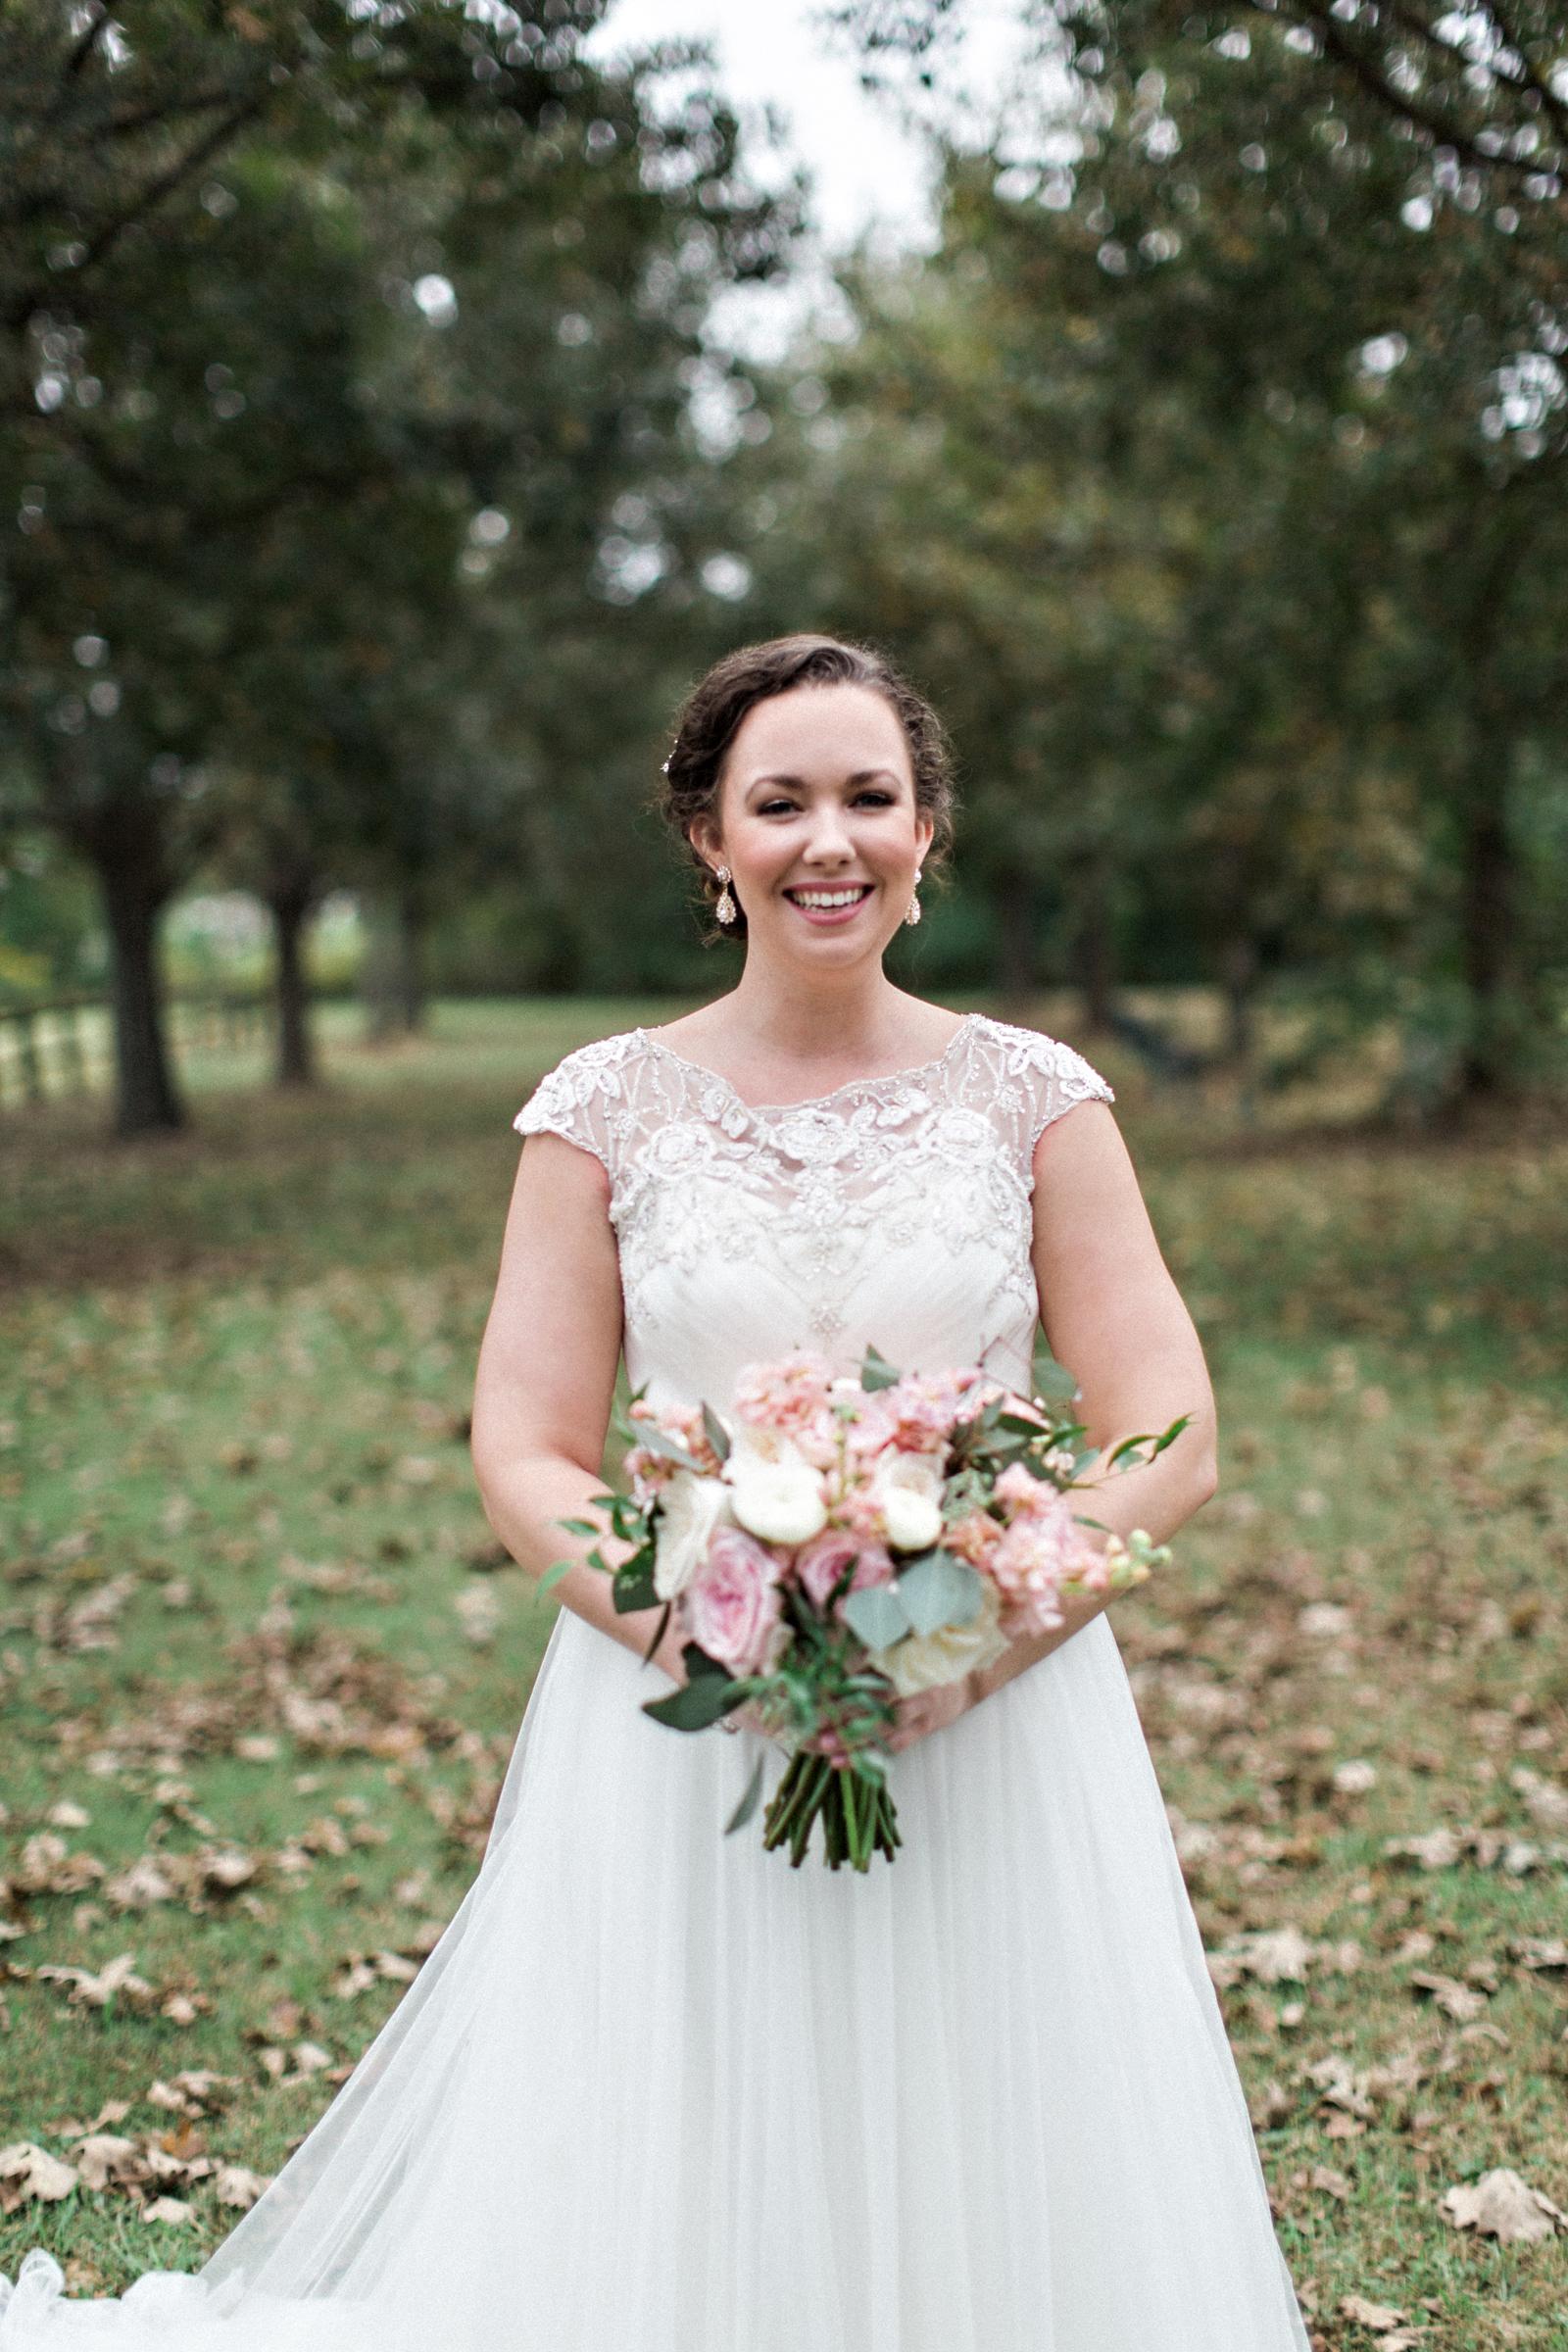 Alabama-Wedding-Photography-Nick-Drollette-Cory-Laura-109.jpg